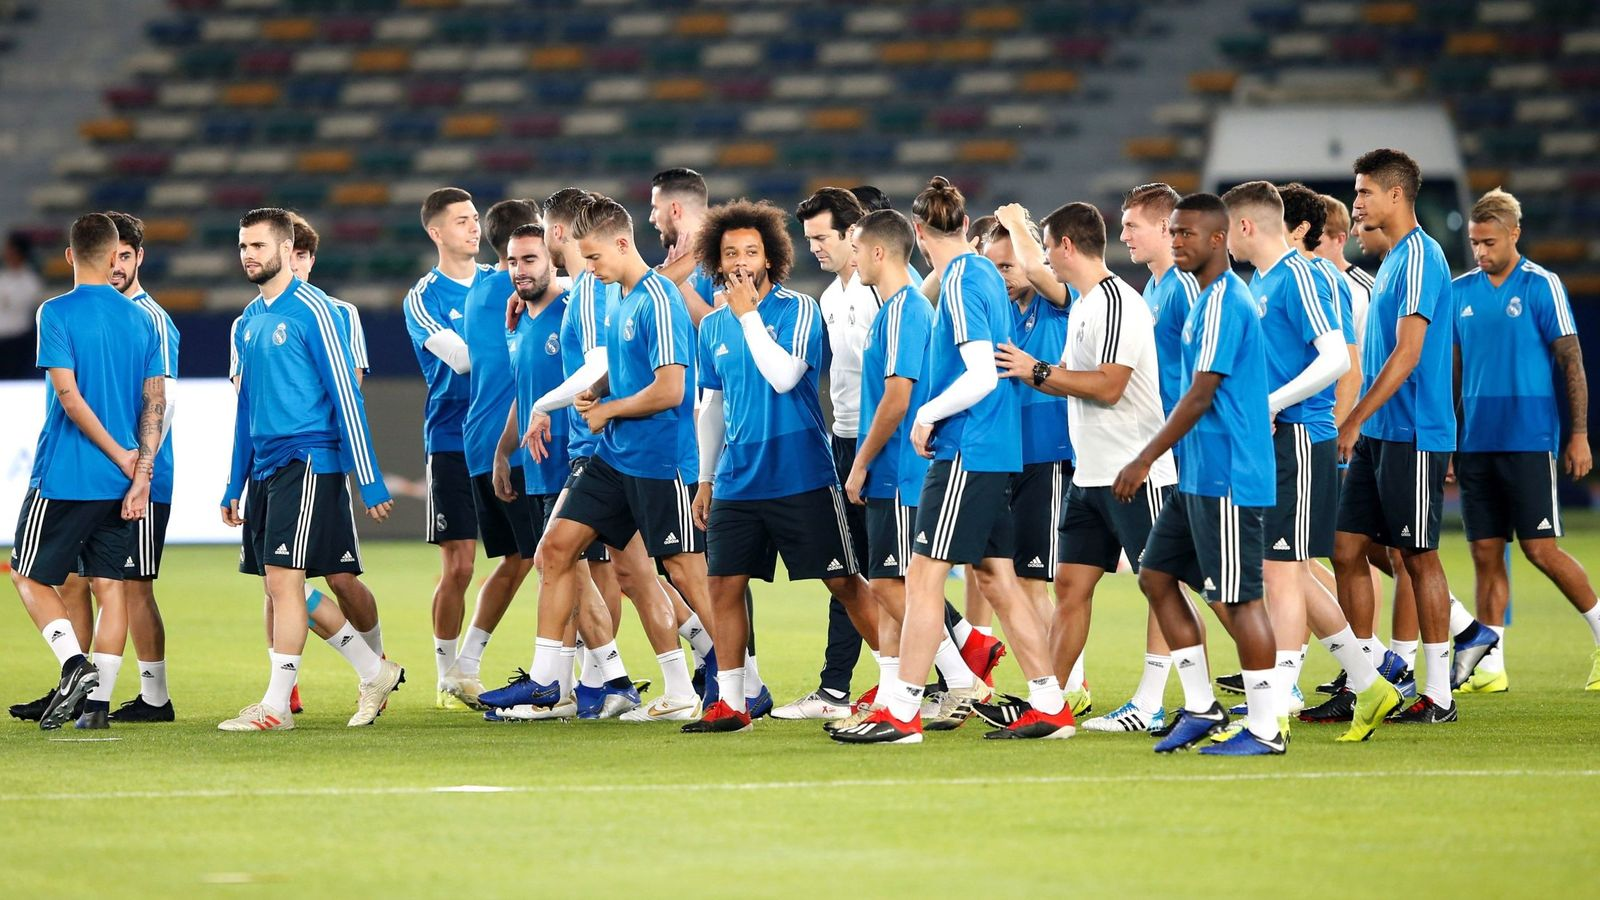 Foto: Fifa mundial de clubes 2018: real madrid